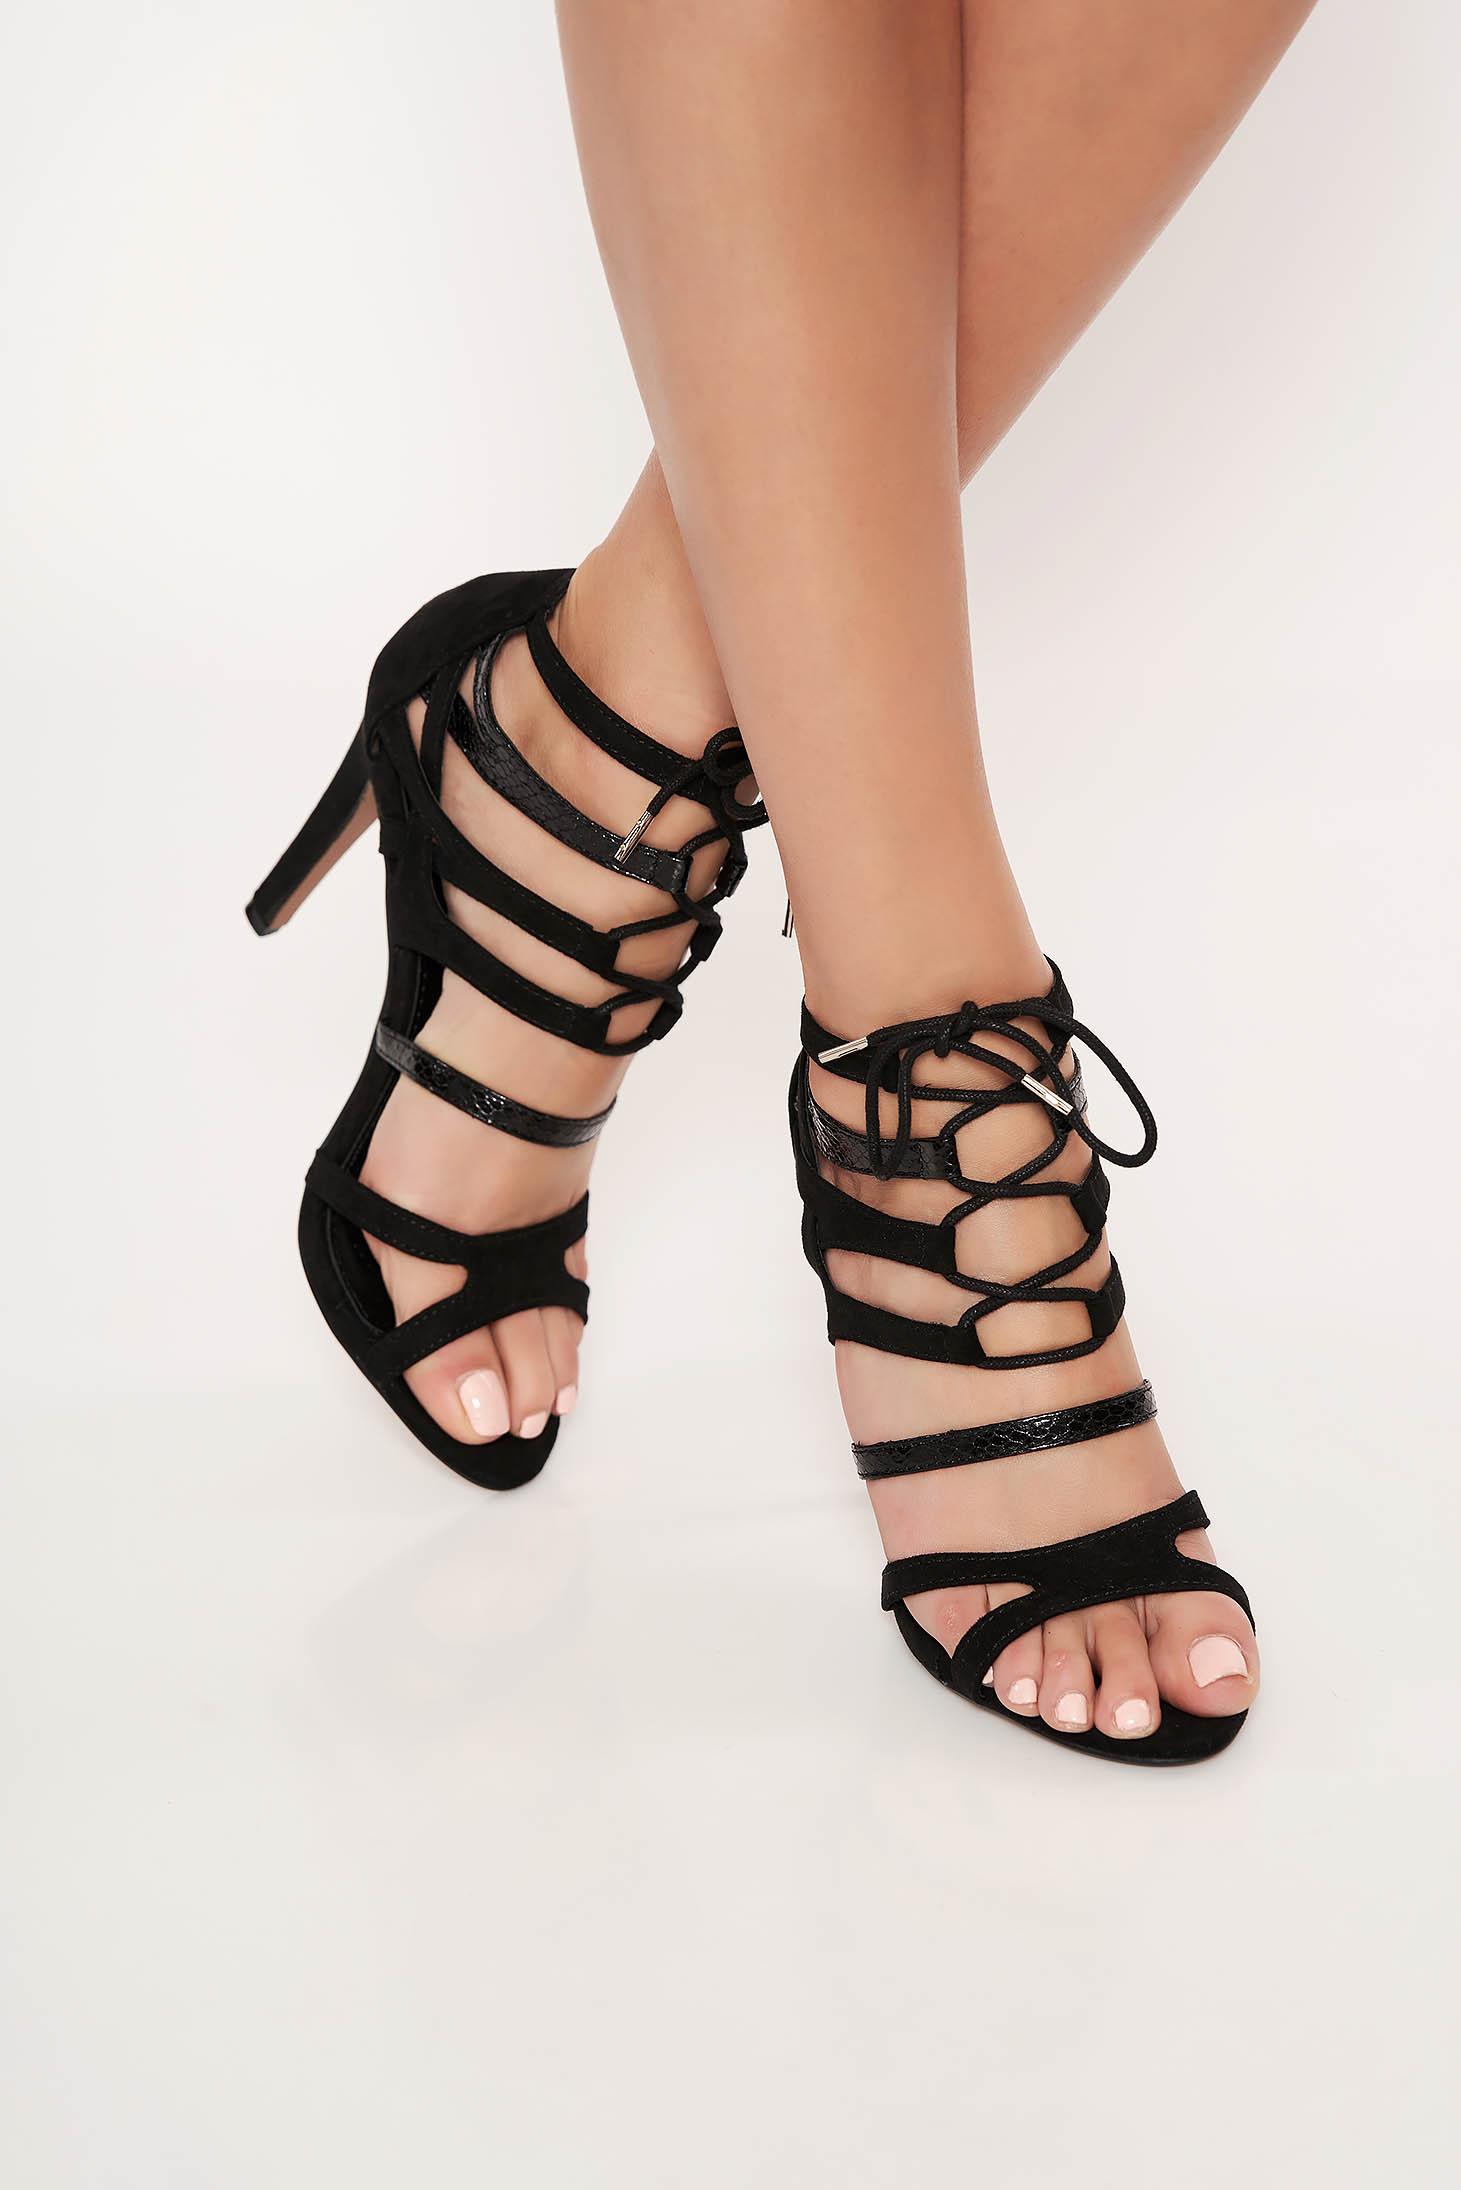 Sandale Top Secret S029846 Black